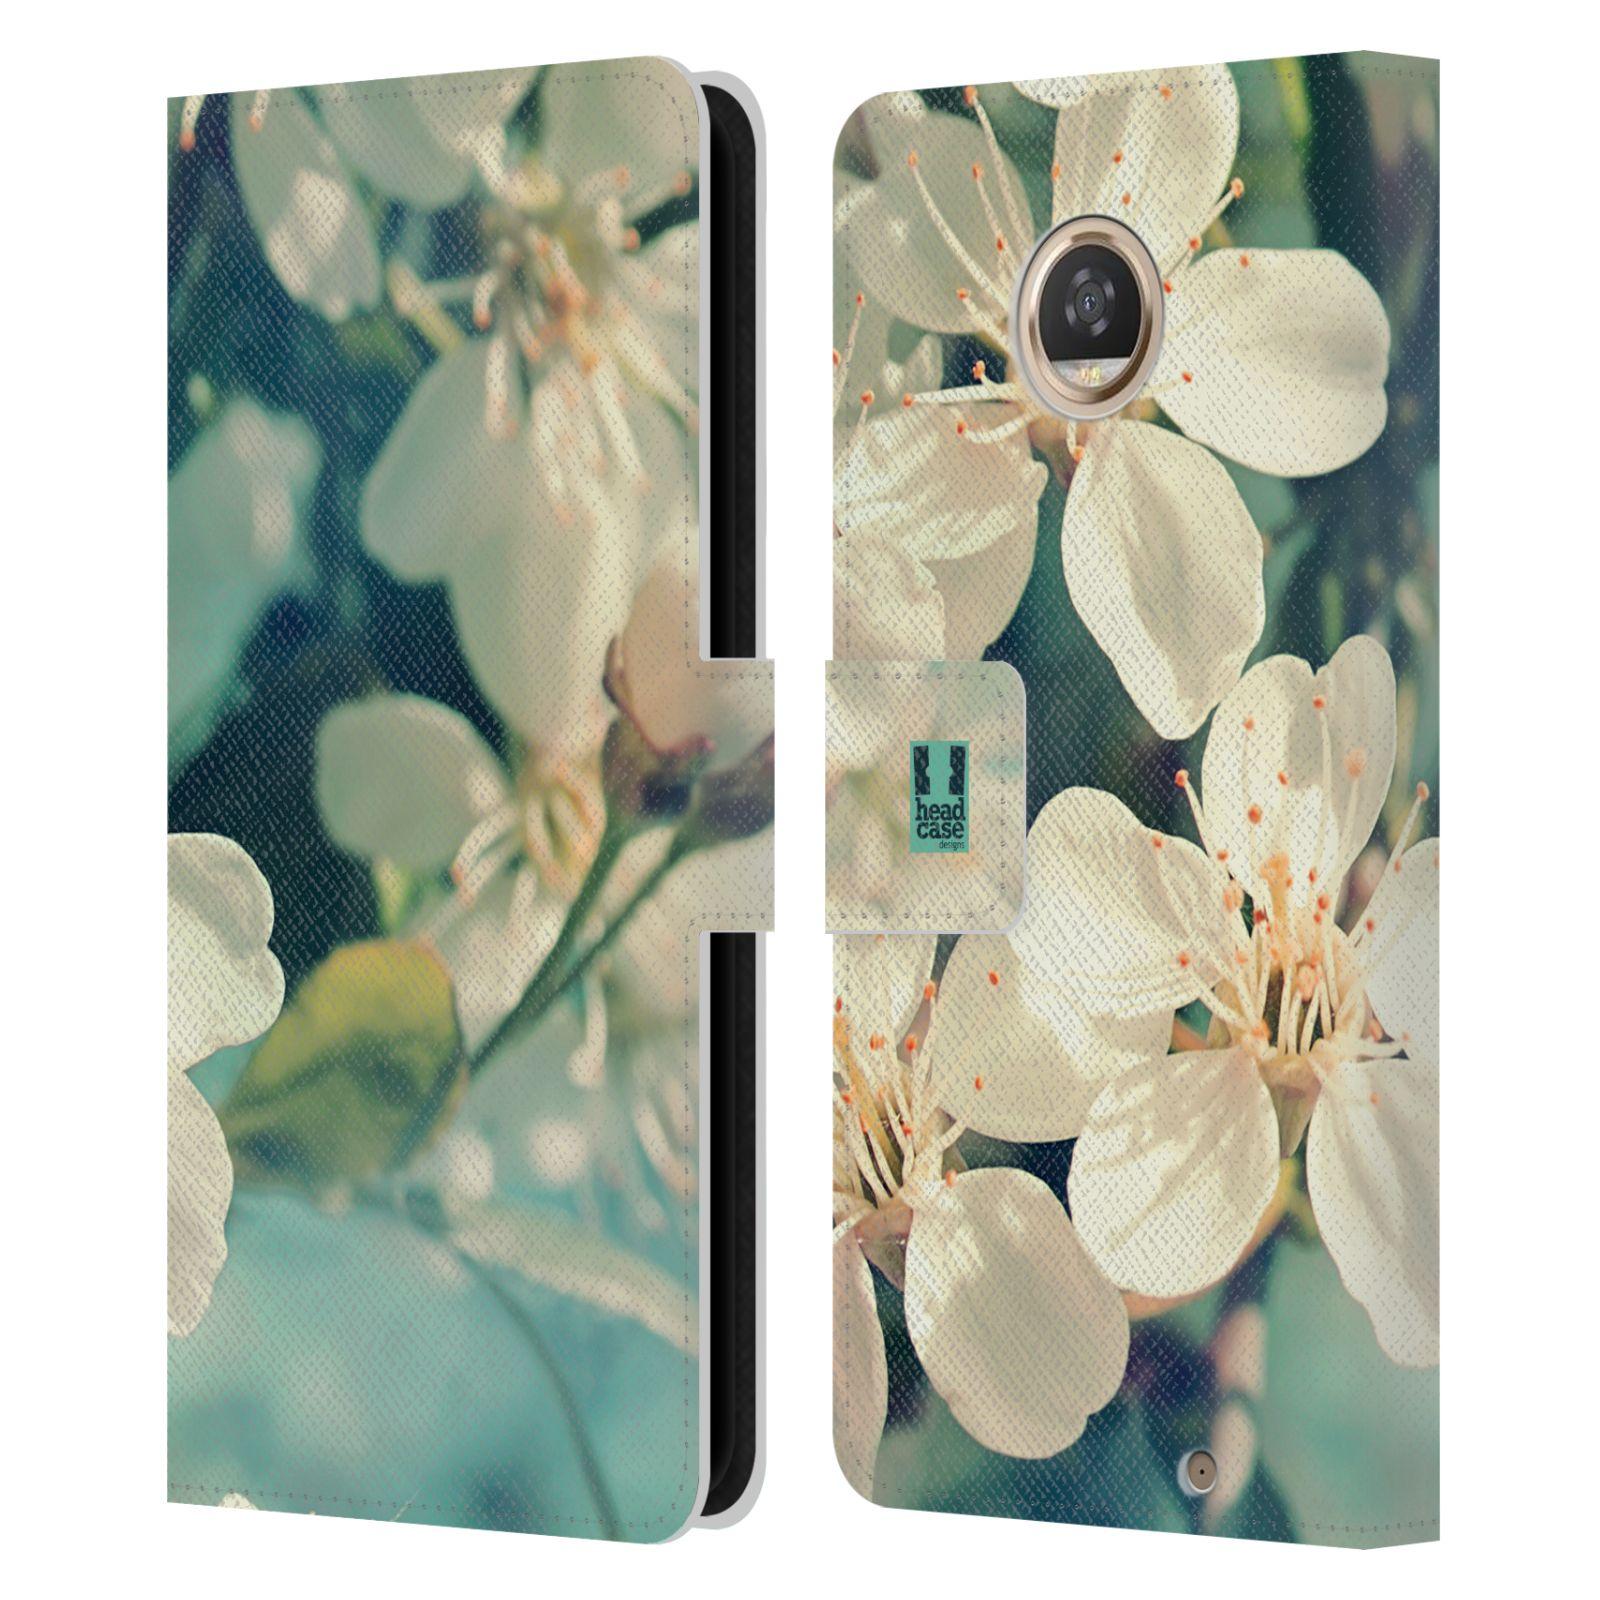 COVER-HEAD-CASE-DESIGNS-Fiori-Libro-in-Pelle-Portafoglio-Custodia-Cover-per-cellulari-Motorola